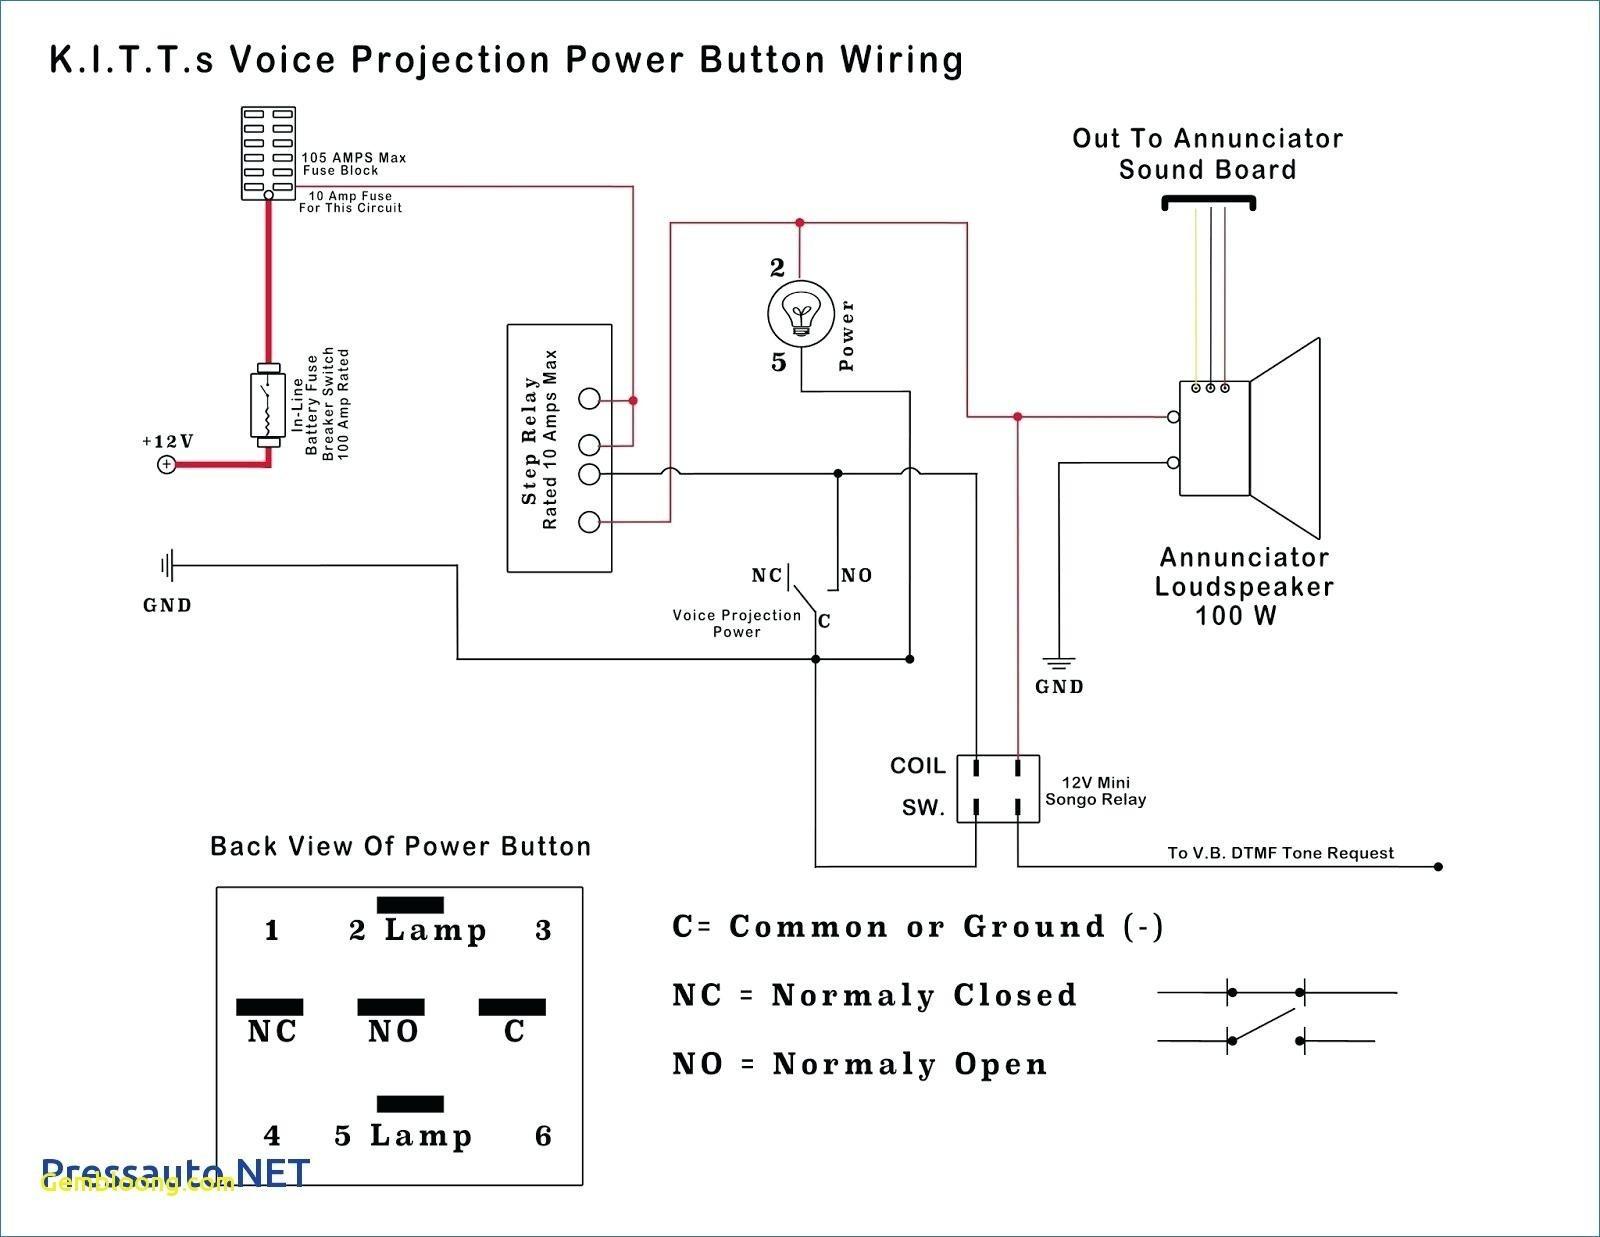 Diagram Of Jet Engine Glow Engine Diagram Experts Wiring Diagram • Of Diagram Of Jet Engine